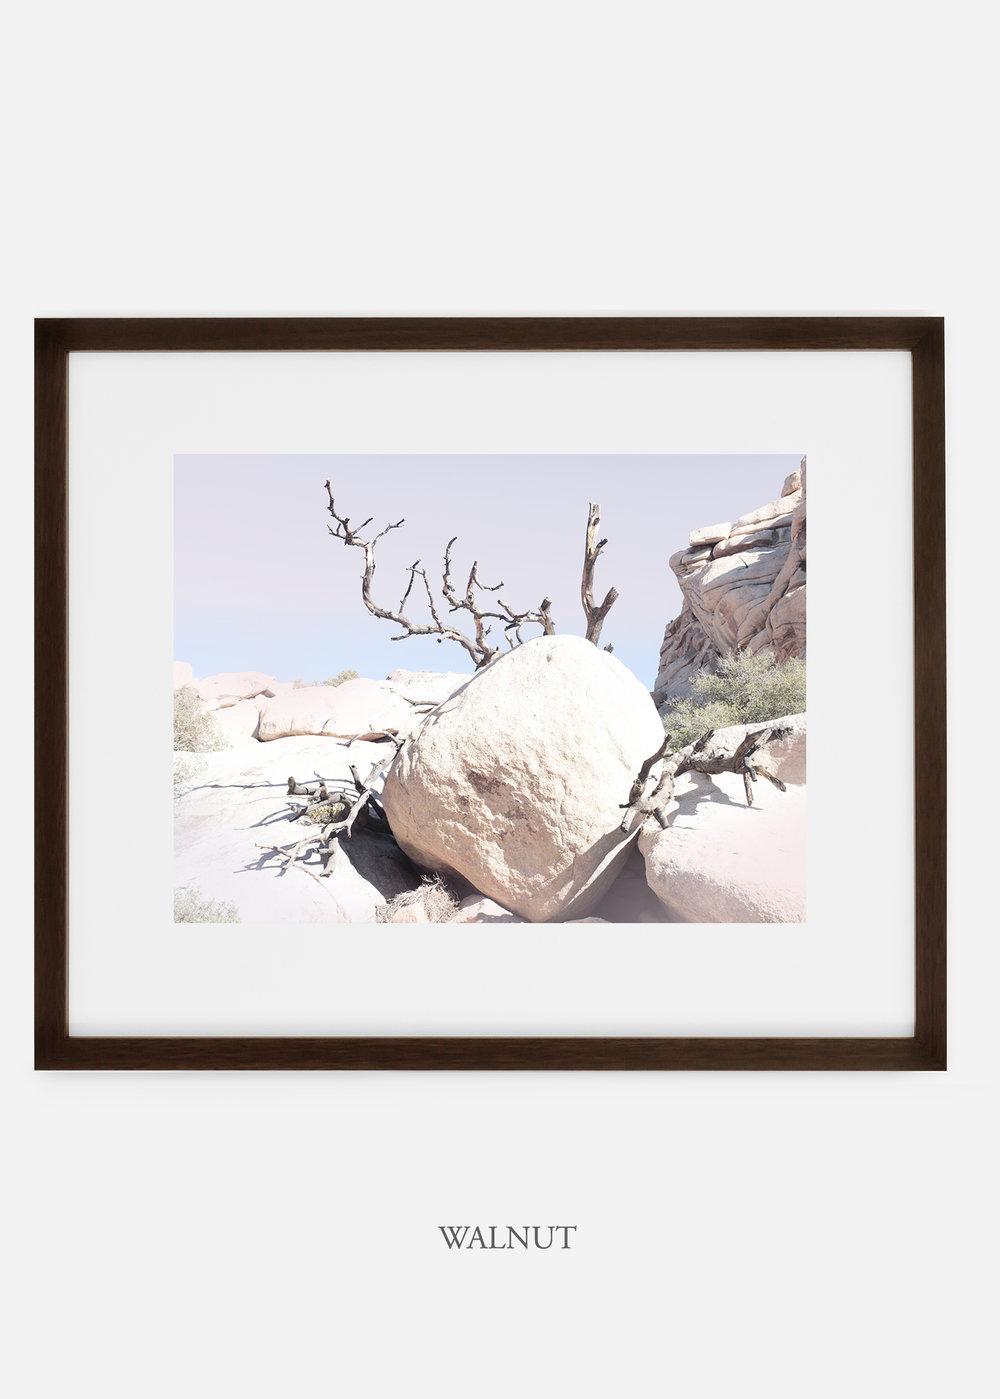 WilderCalifornia_walnut_JoshuaTree_No.17_interiordesign_prints_art.jpg